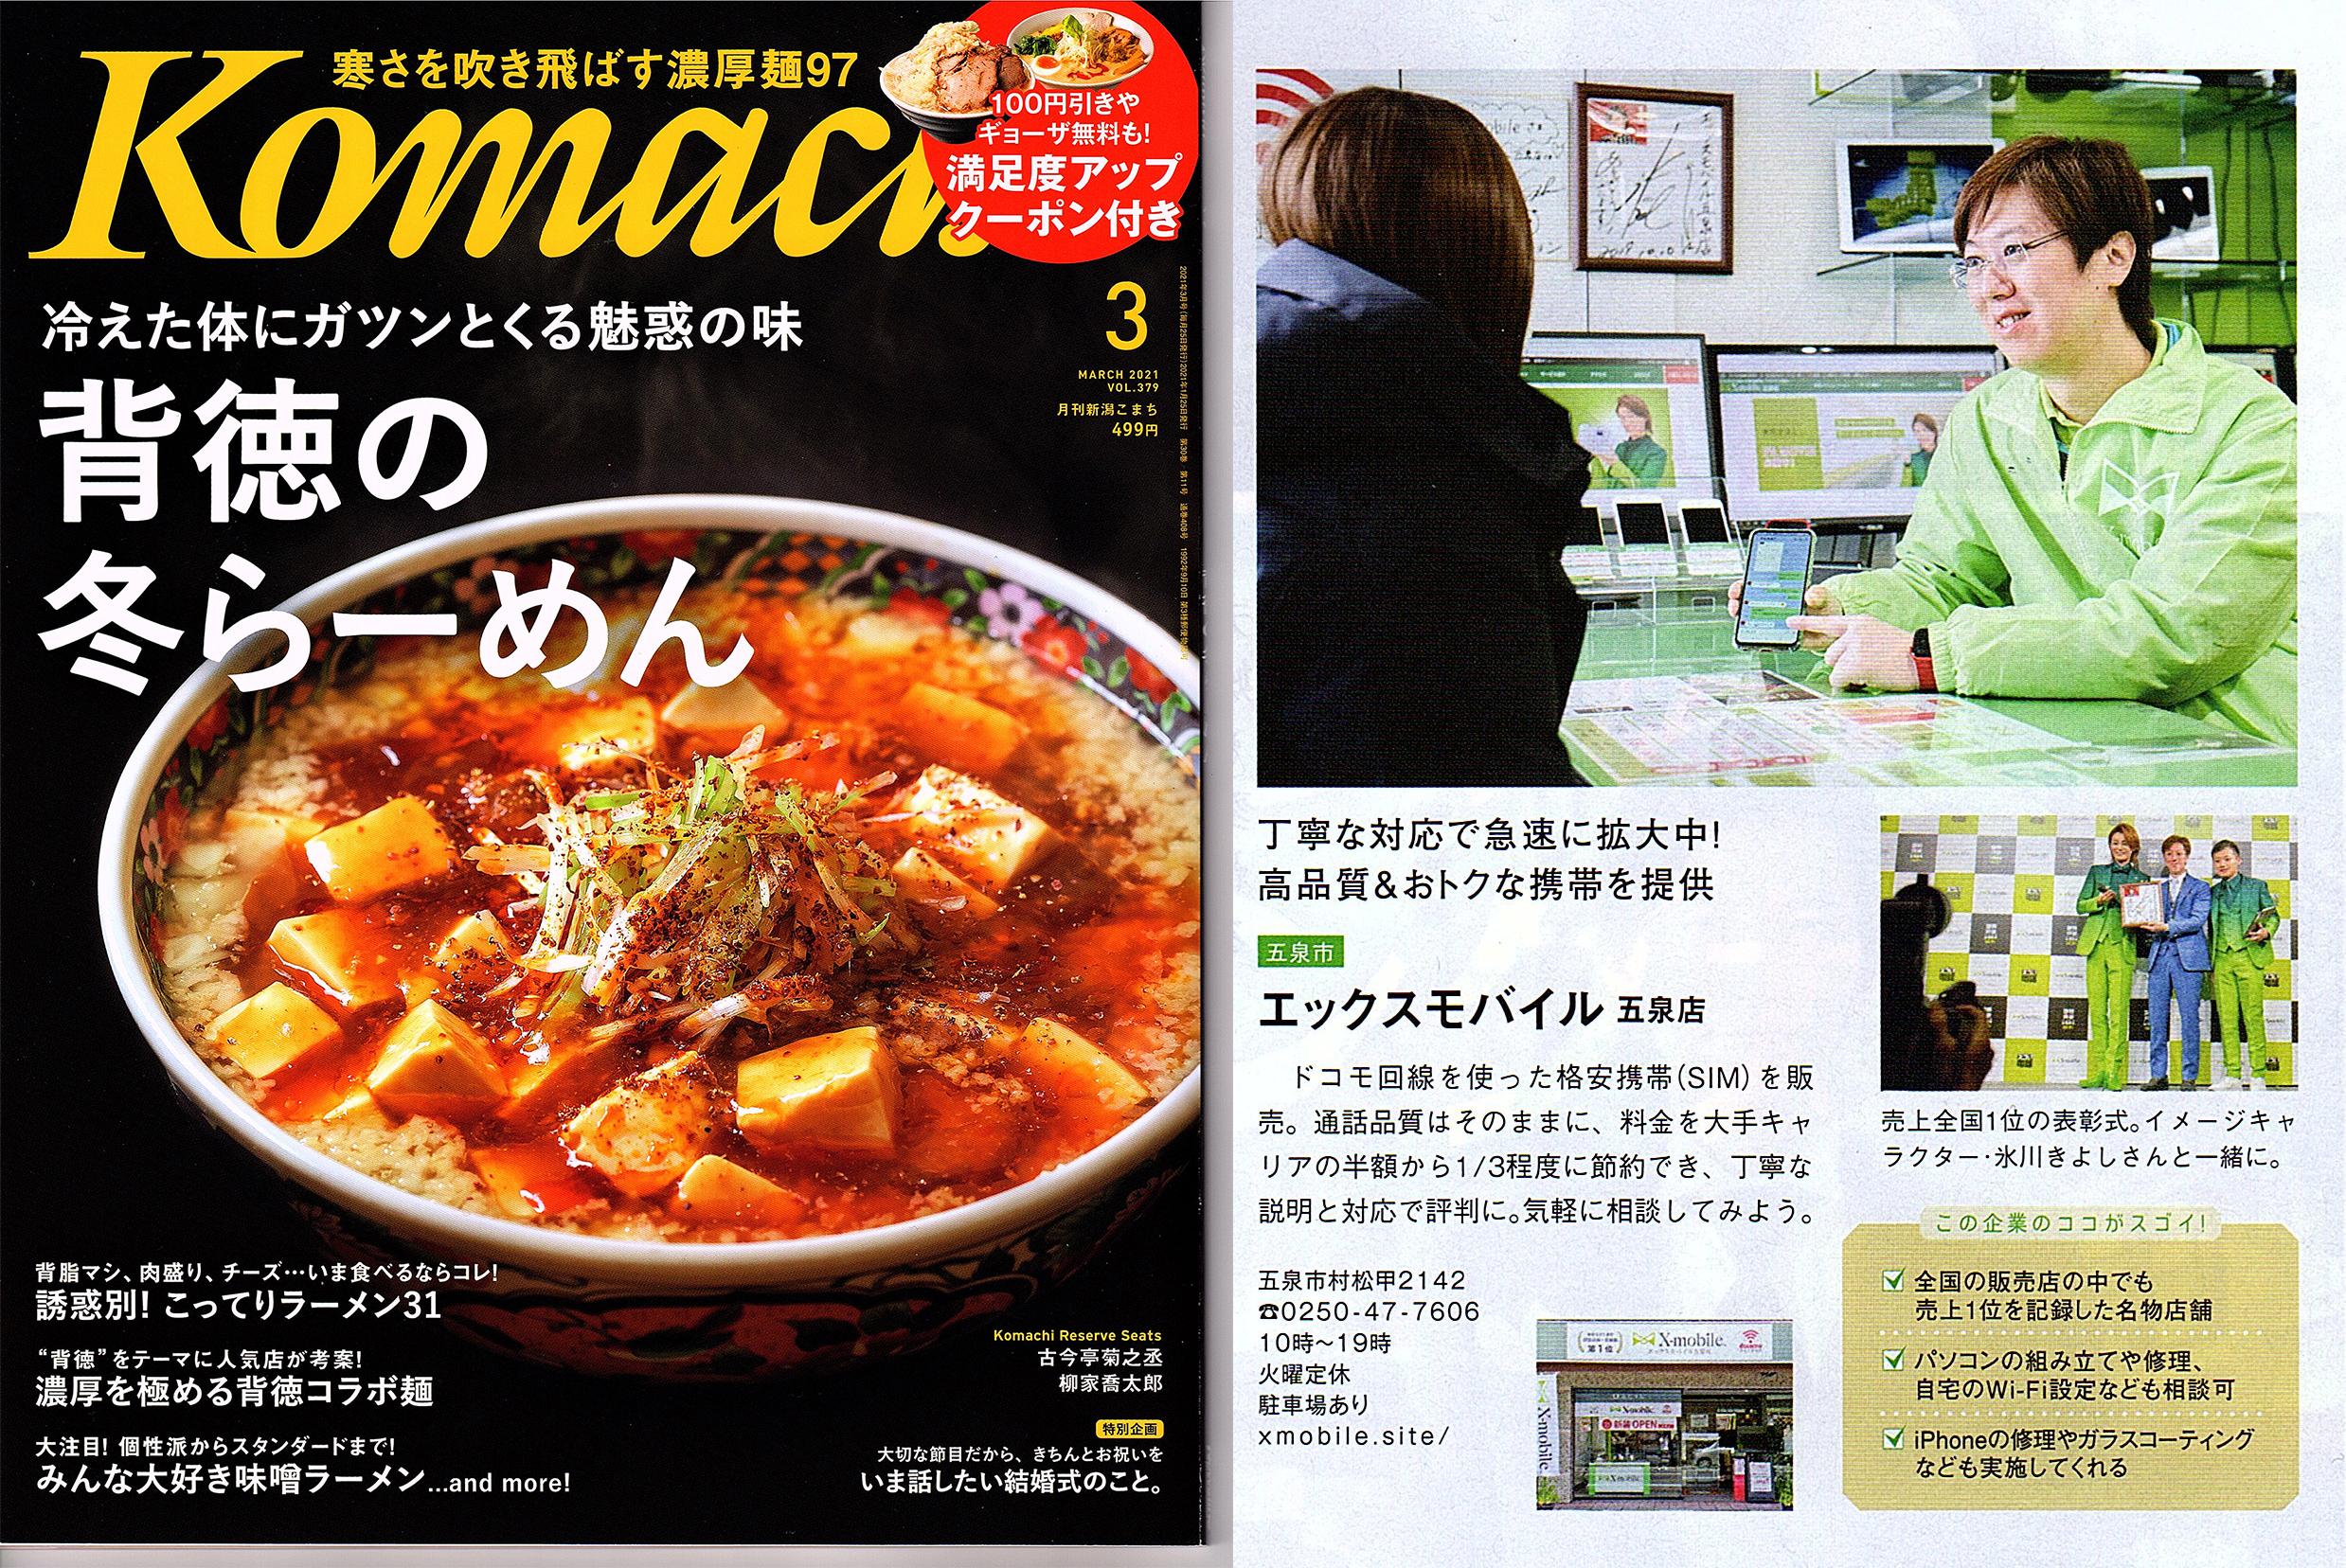 月刊新潟Komachi2021年3月号Xモバイル五泉店掲載